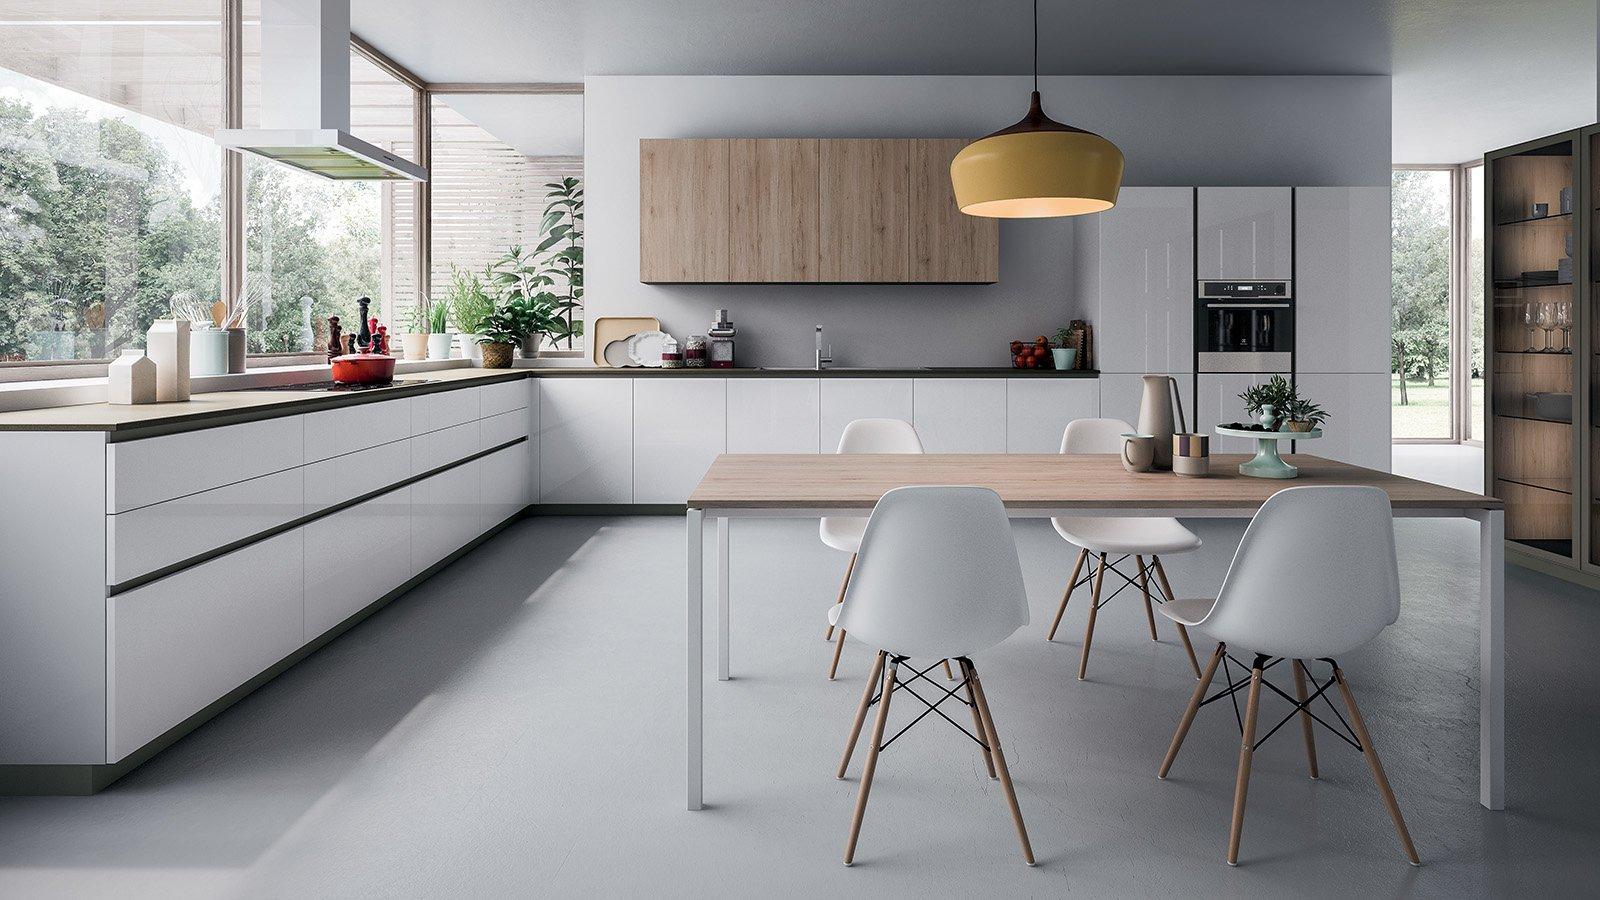 Olasz konyhabútor fehérben